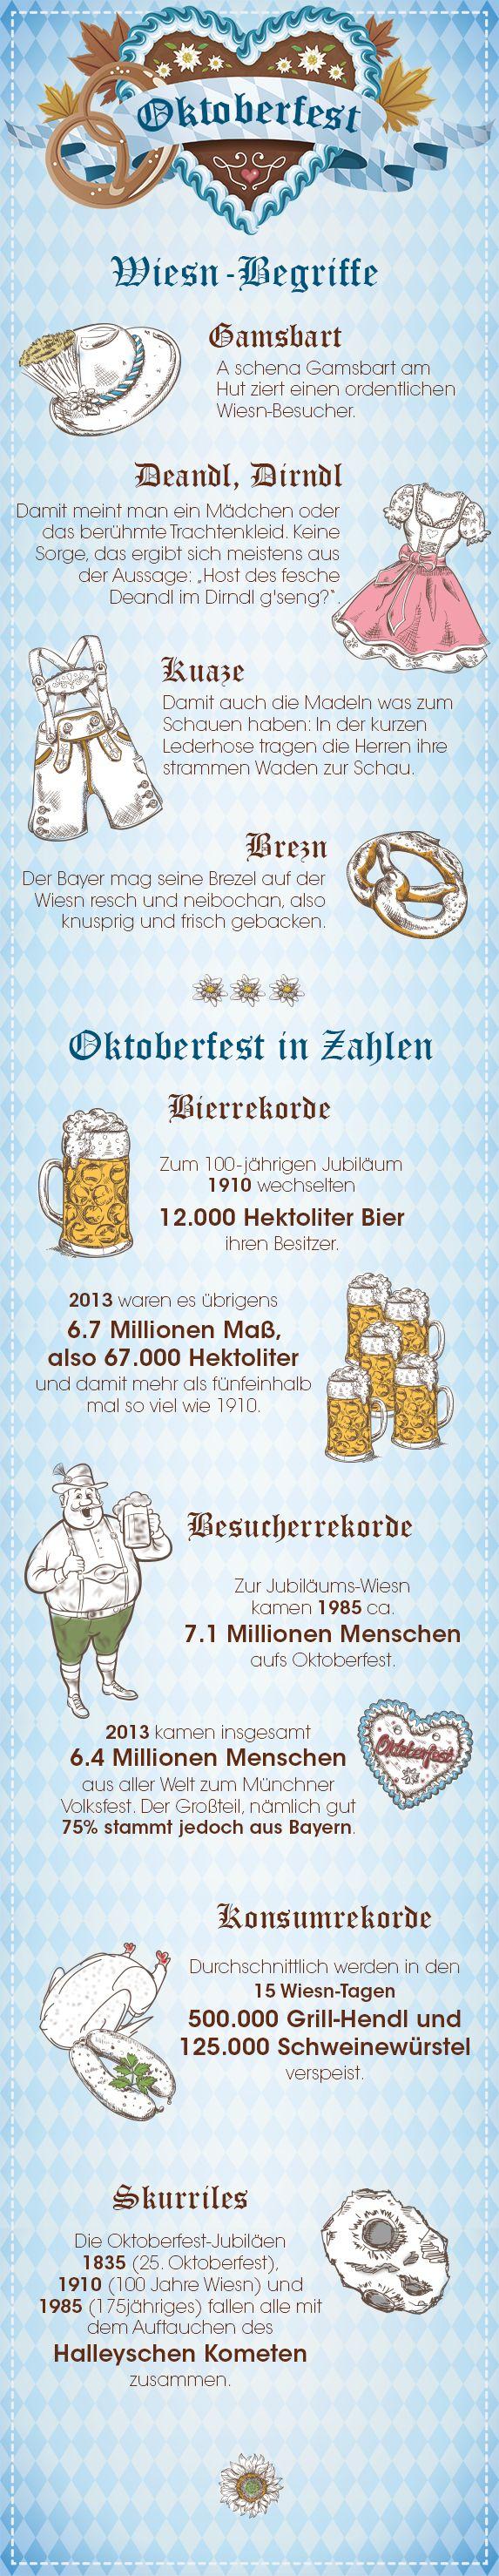 #Infografik #Oktoberfest2014 #Wiesn